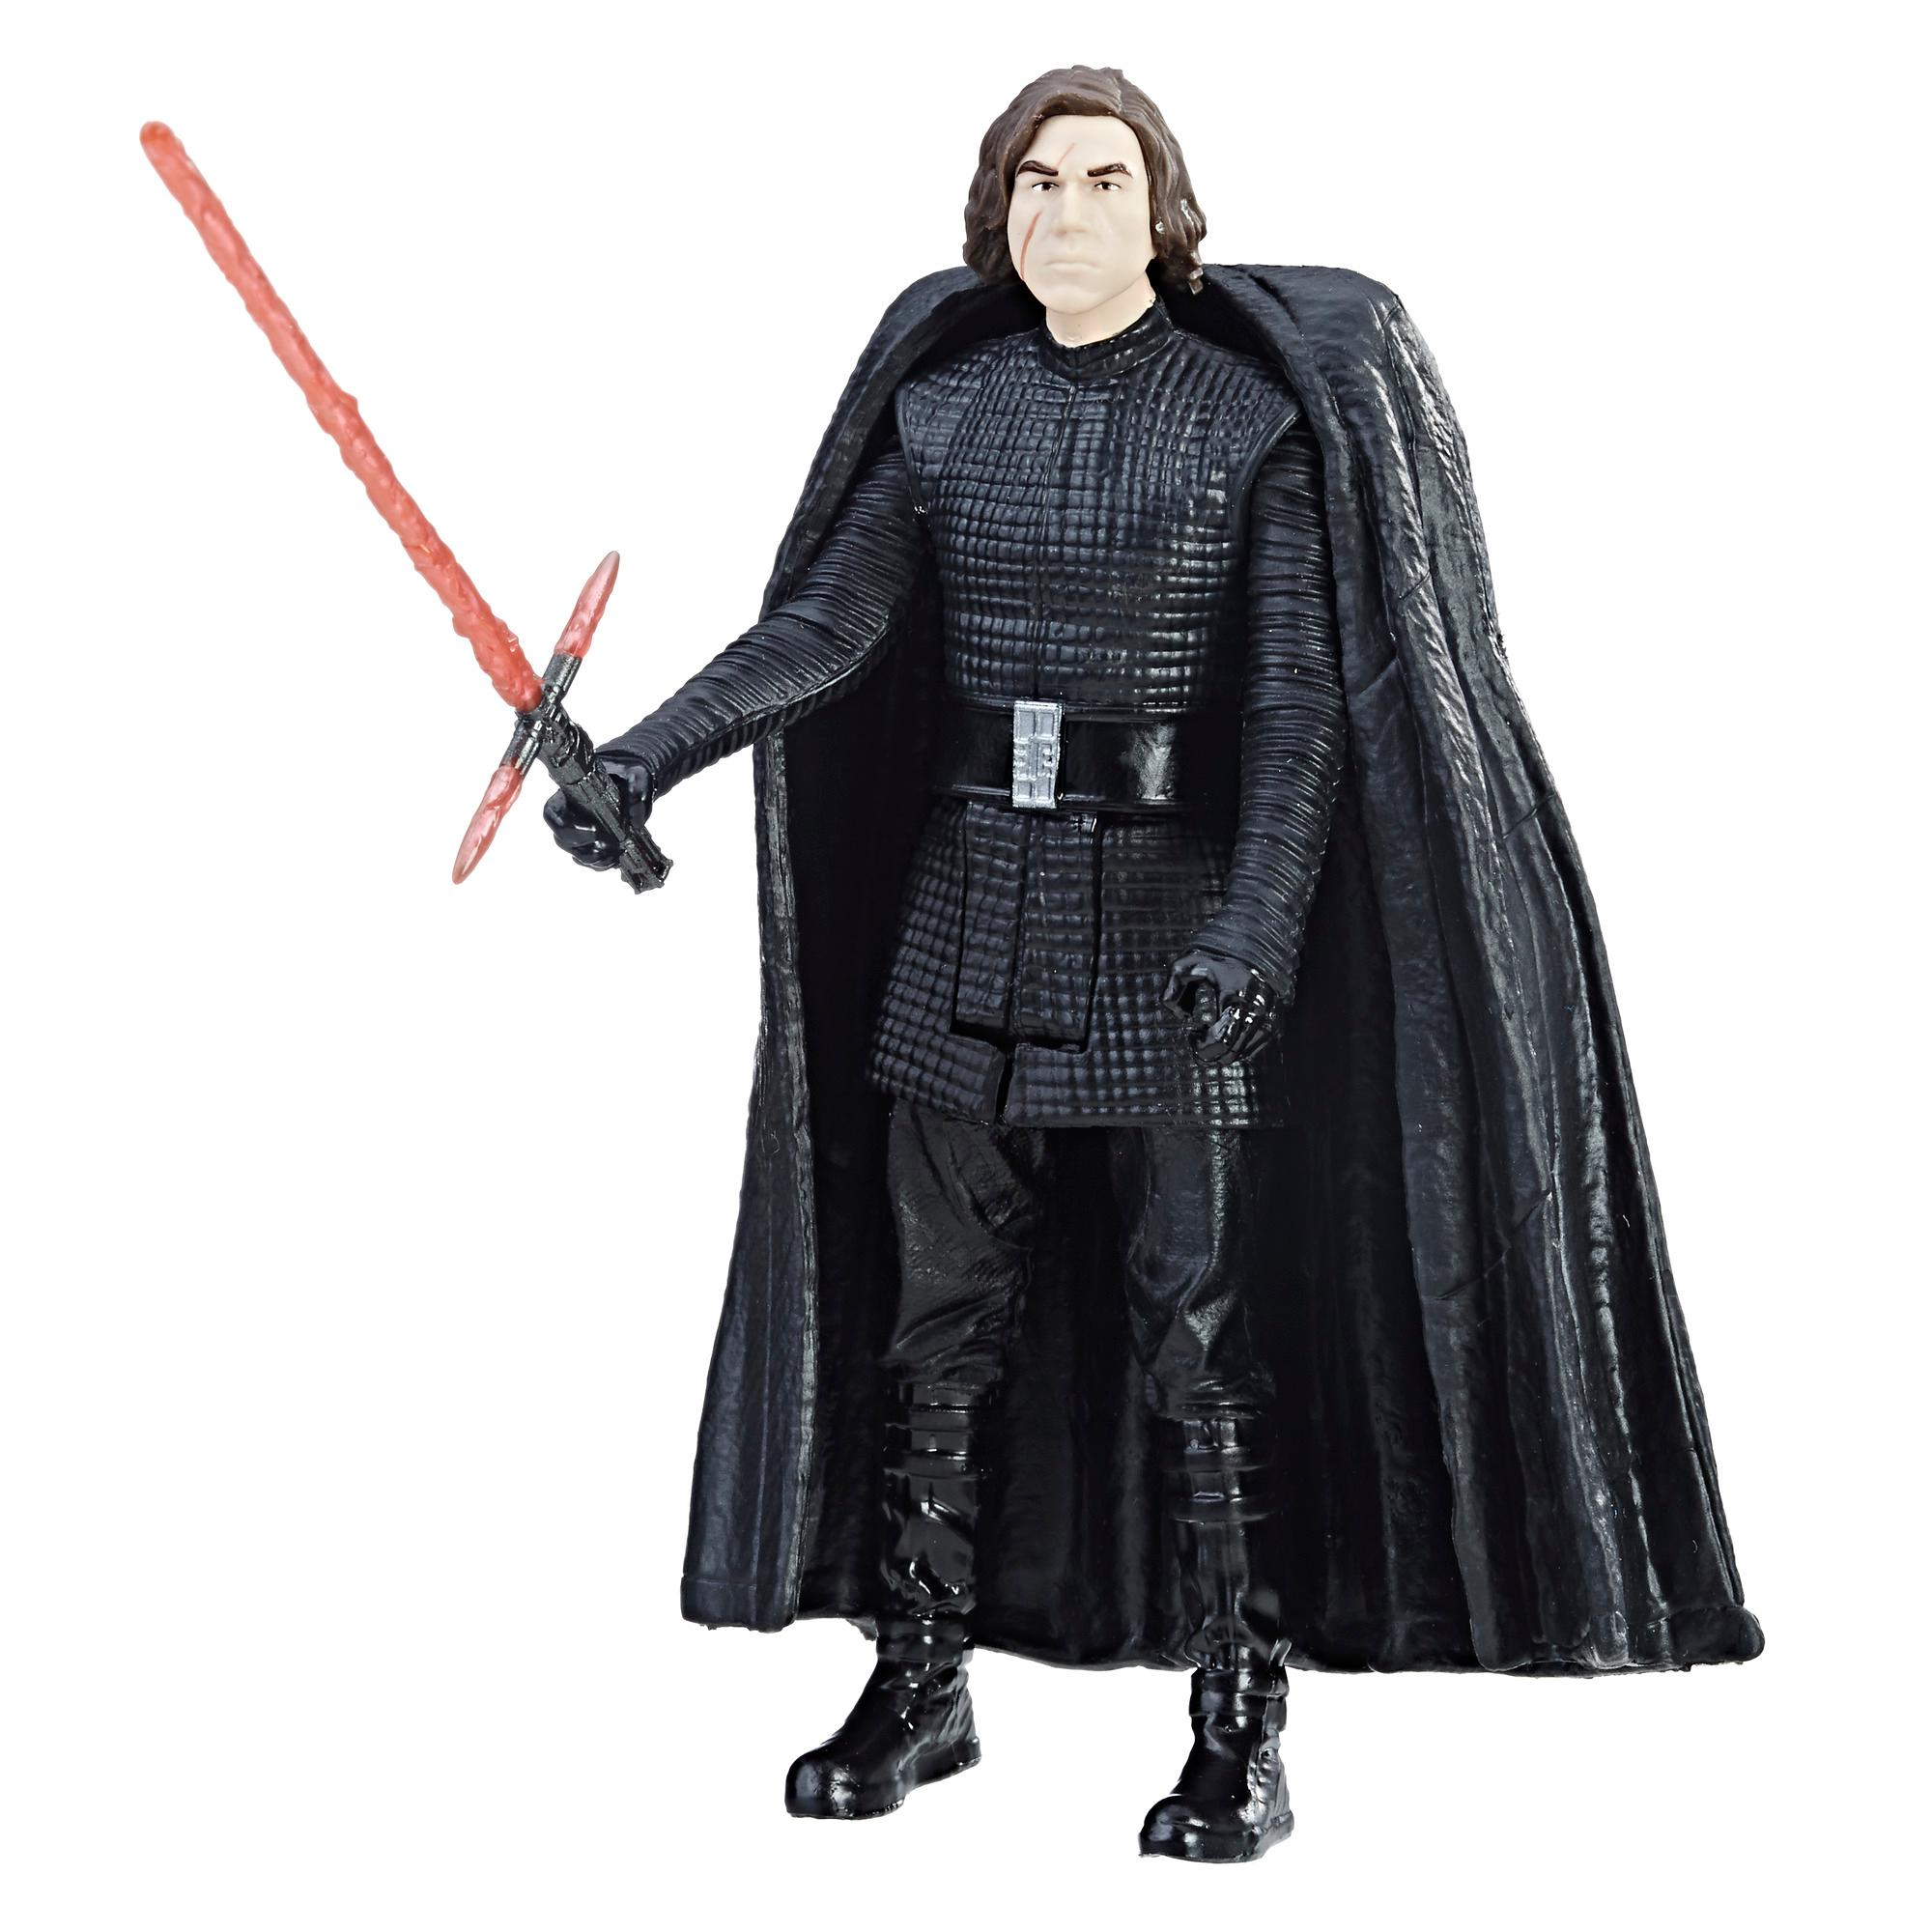 Star Wars - Figurine Force Link Kylo Ren